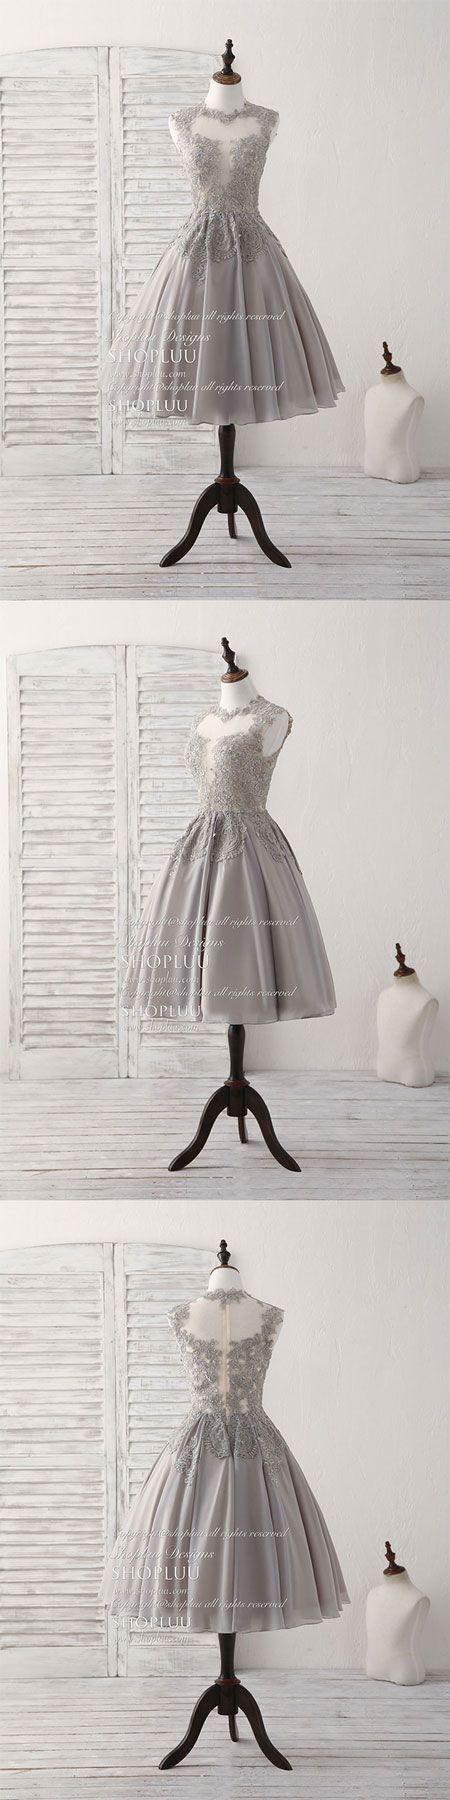 Gray high neck lace chiffon short prom dress gray bridesmaid dress